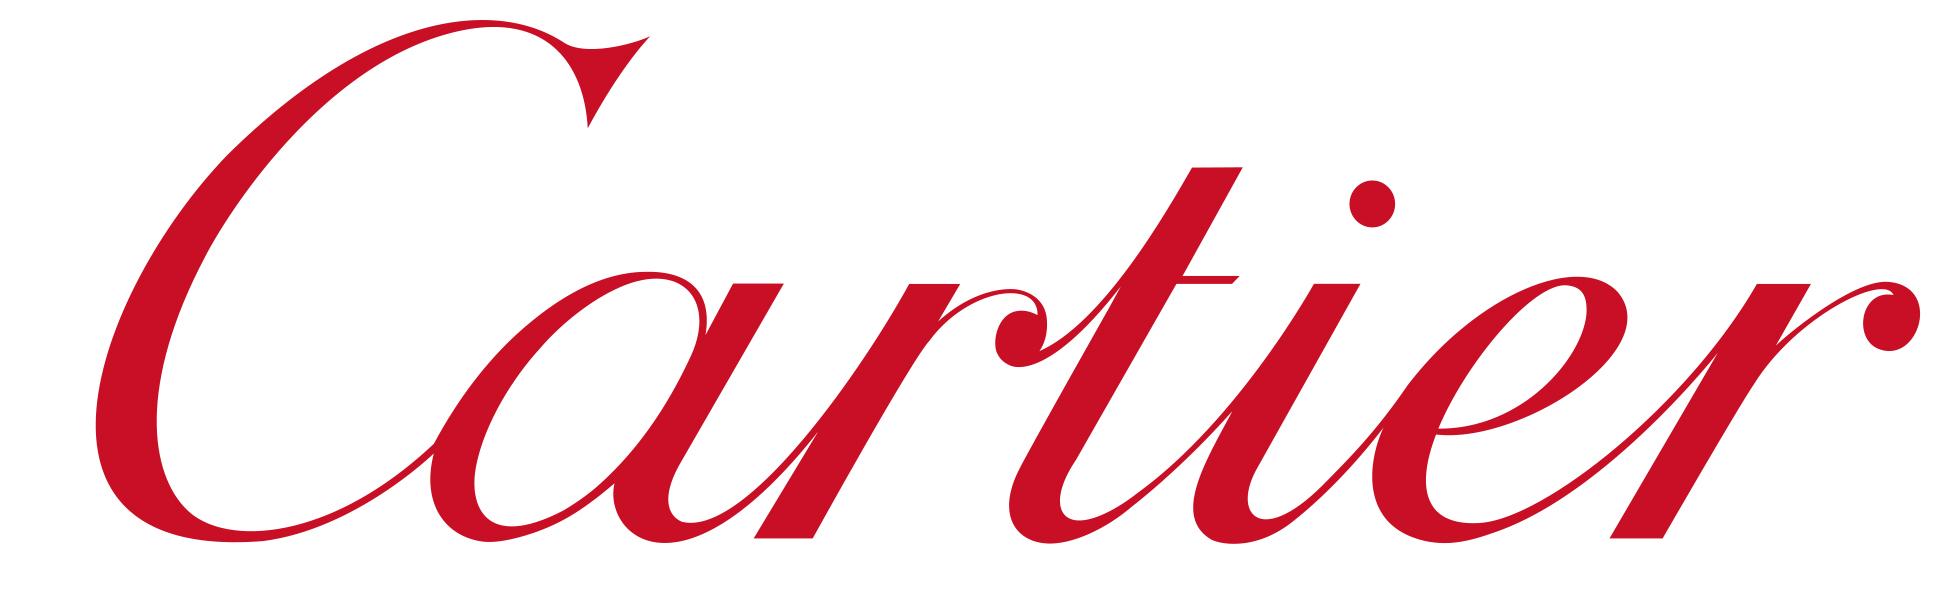 super popular a30a0 34c9b カルティエ/Cartierの店舗一覧│マイナビウエディング ...